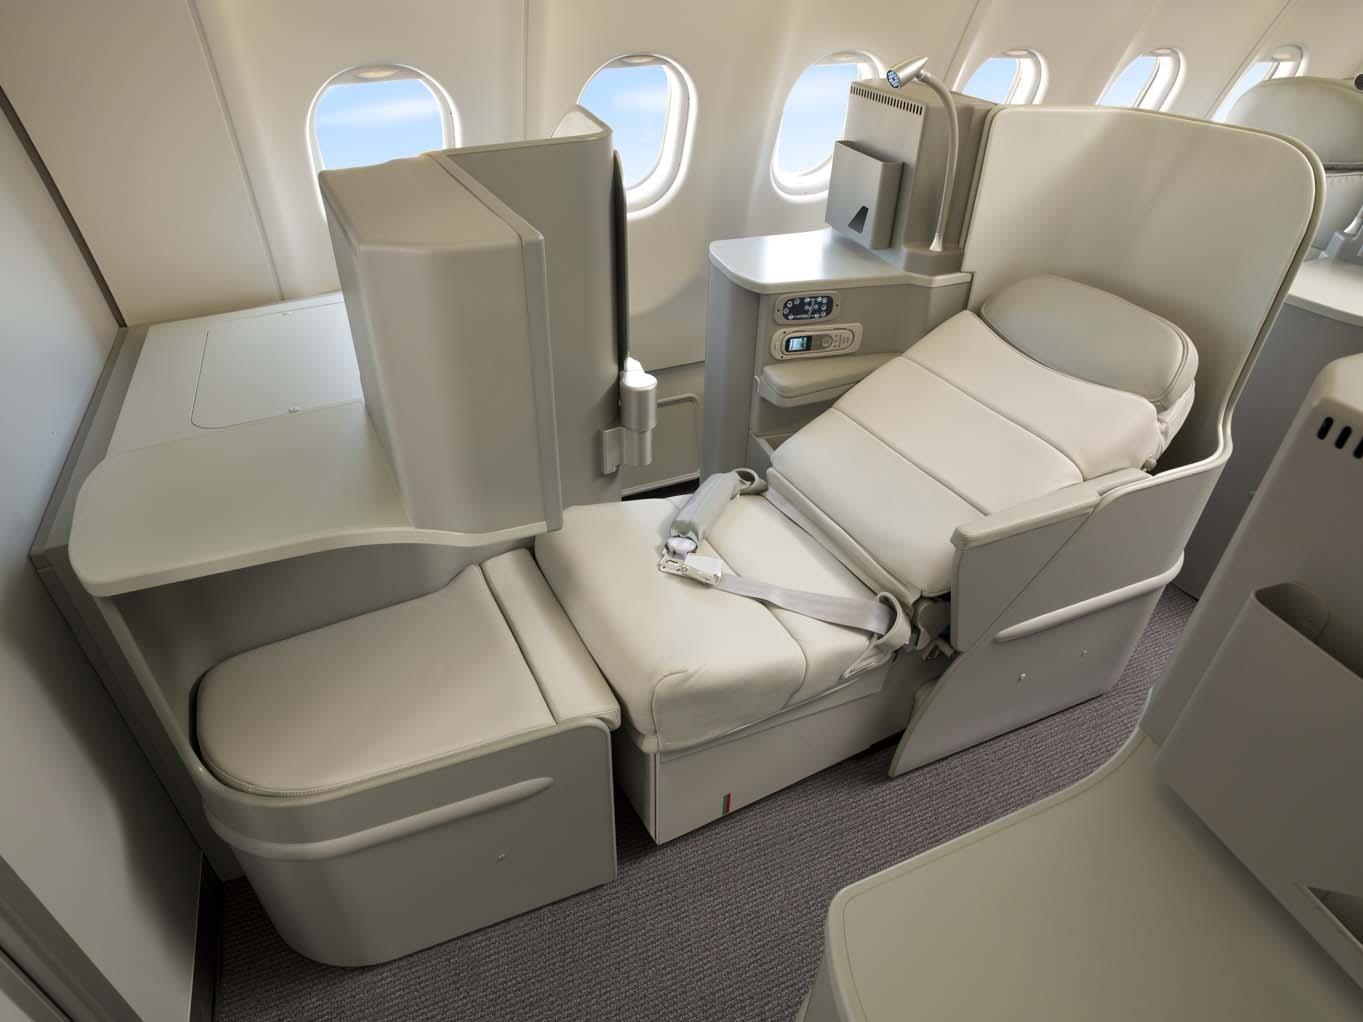 Alitalia Award Availability on Delta: Magnifica Business Class Seat